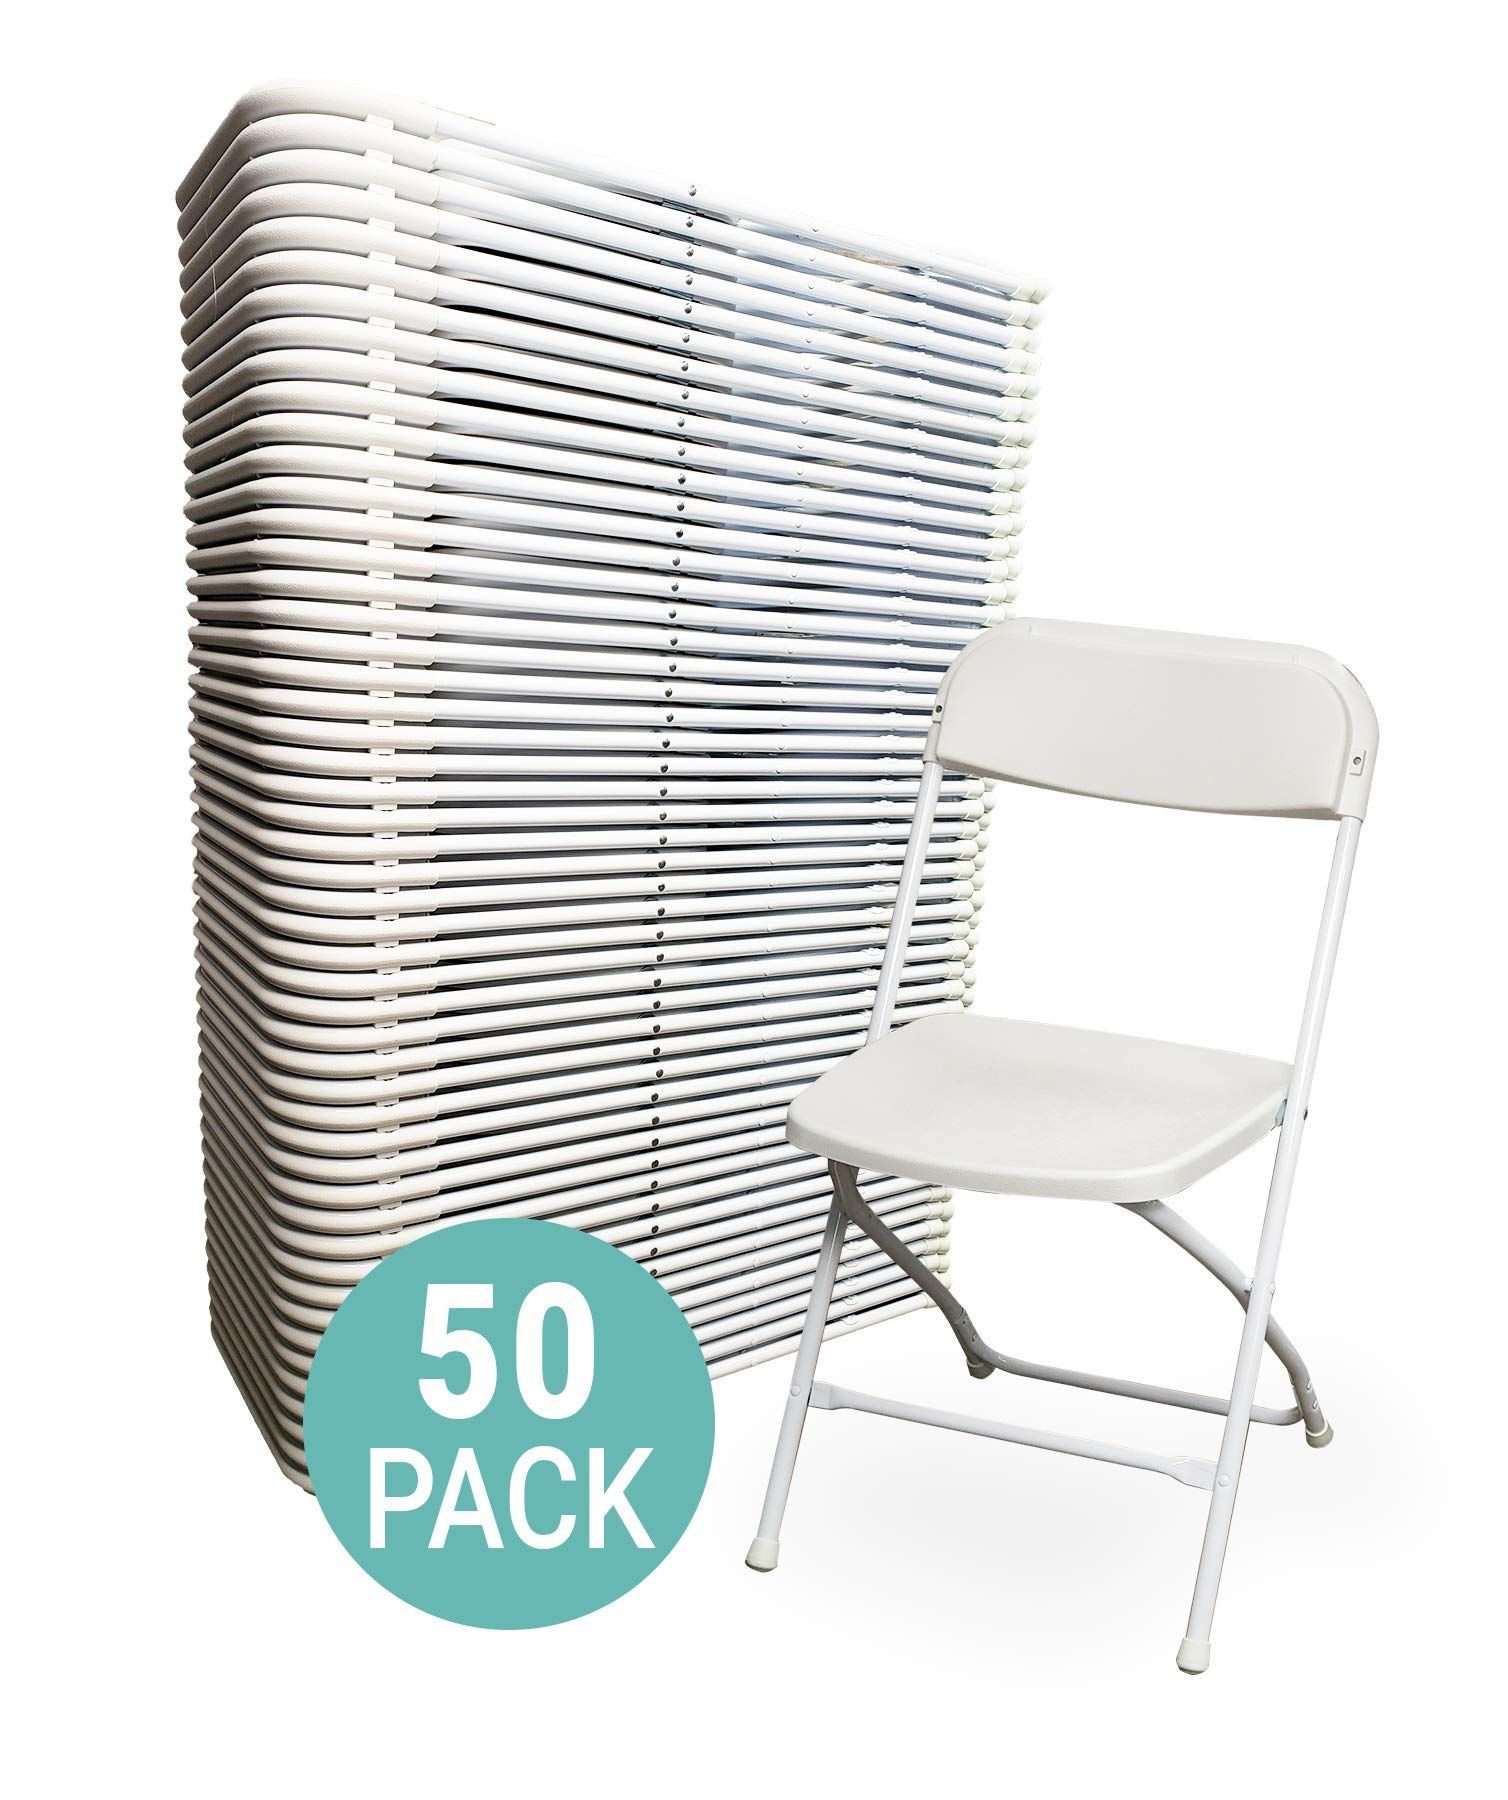 Eventstable Titanpro Plastic Folding Chair White 50 Pack